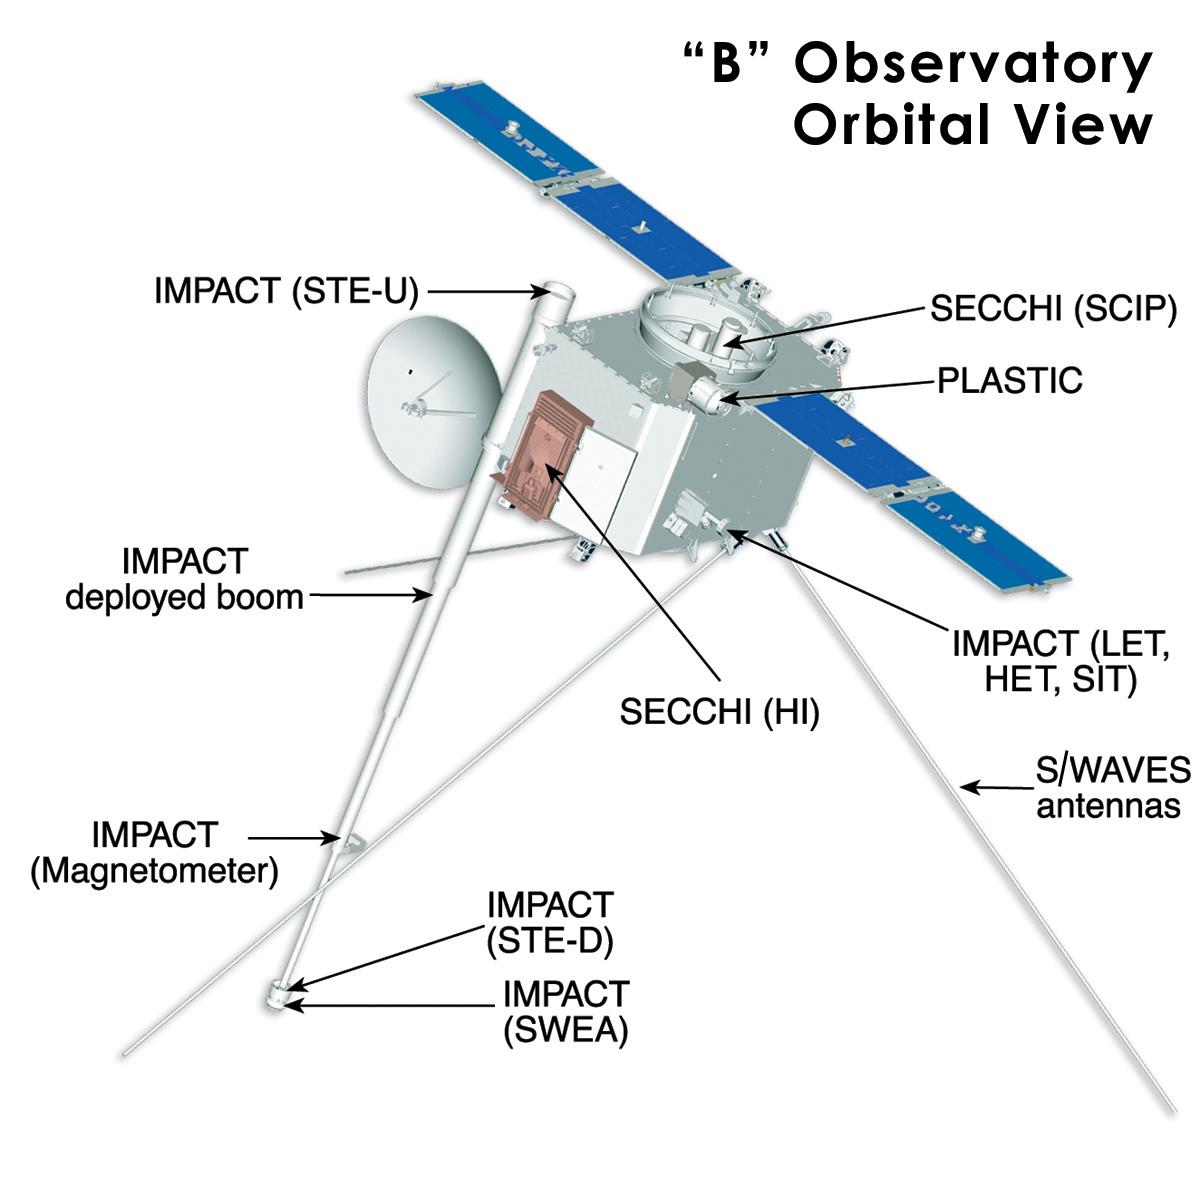 NASA - STEREO Telecon Multimedia Page